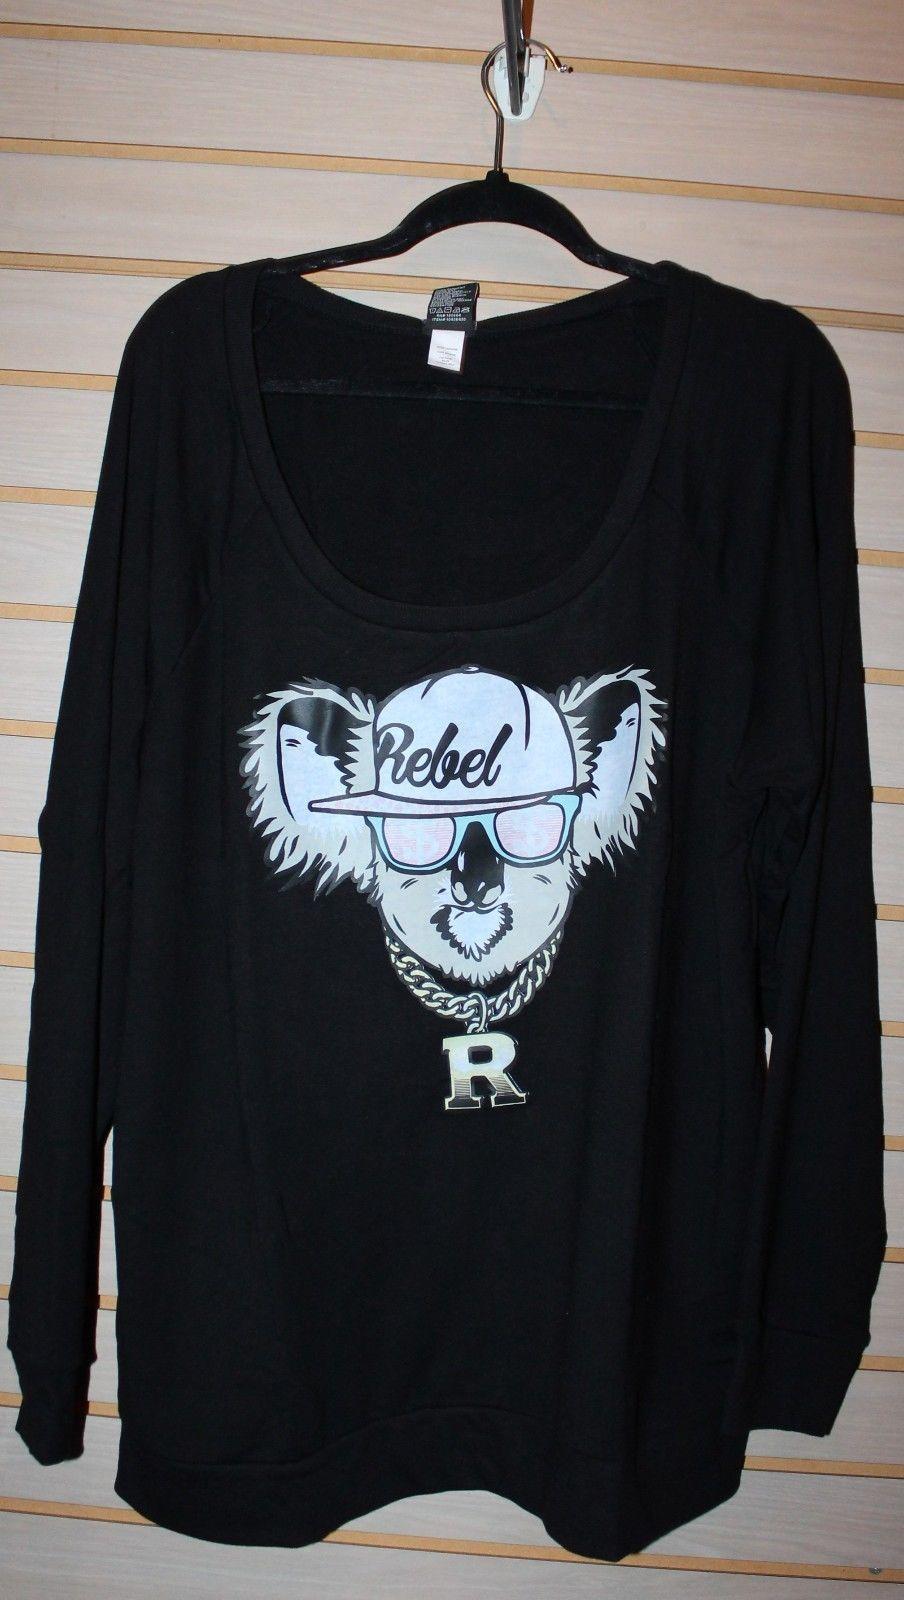 c19fe14ff5f New Torrid Womens Plus Size 5X 5 Black Rebel and 50 similar items. 57